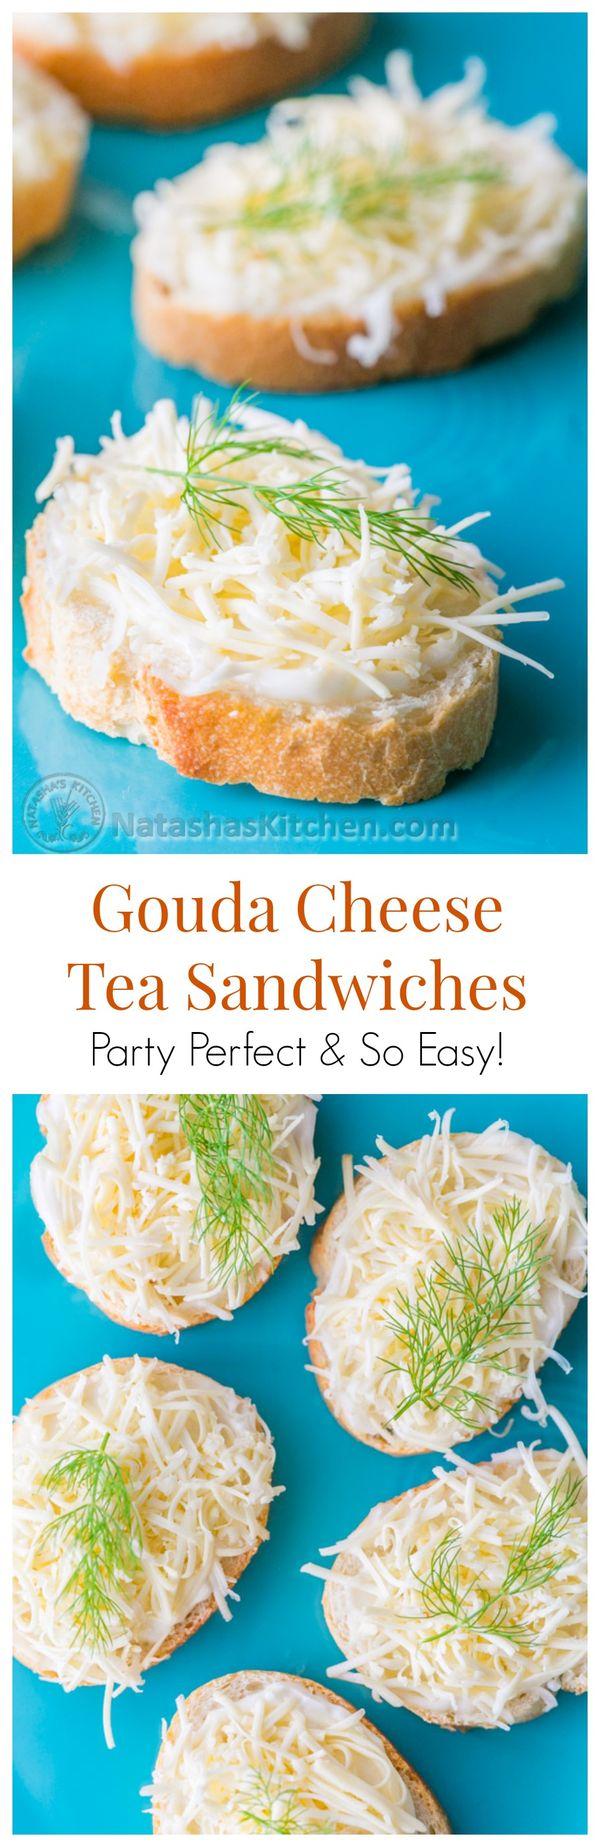 Gouda Cheese Tea Sandwiches (Only 4 ingredients!) Keep this recipe in your party arsenal! | @natashaskitchen